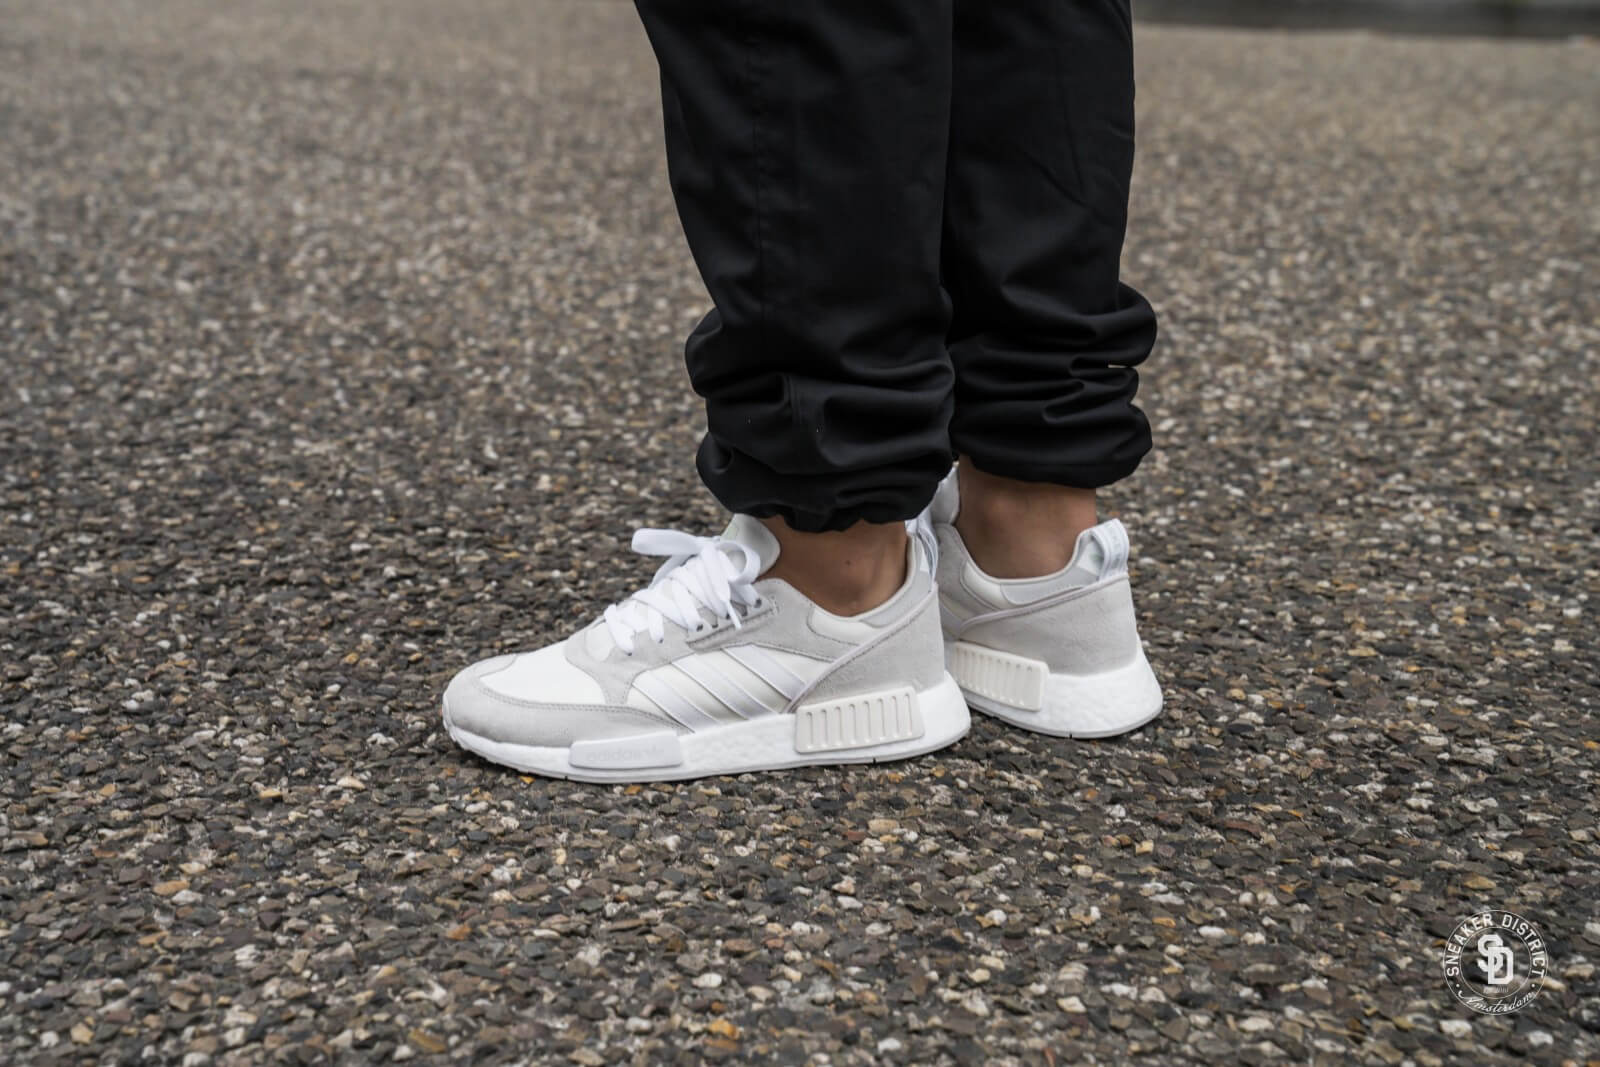 Adidas Boston x Super R1 Cloud WhiteFootwear White One Grey G27834